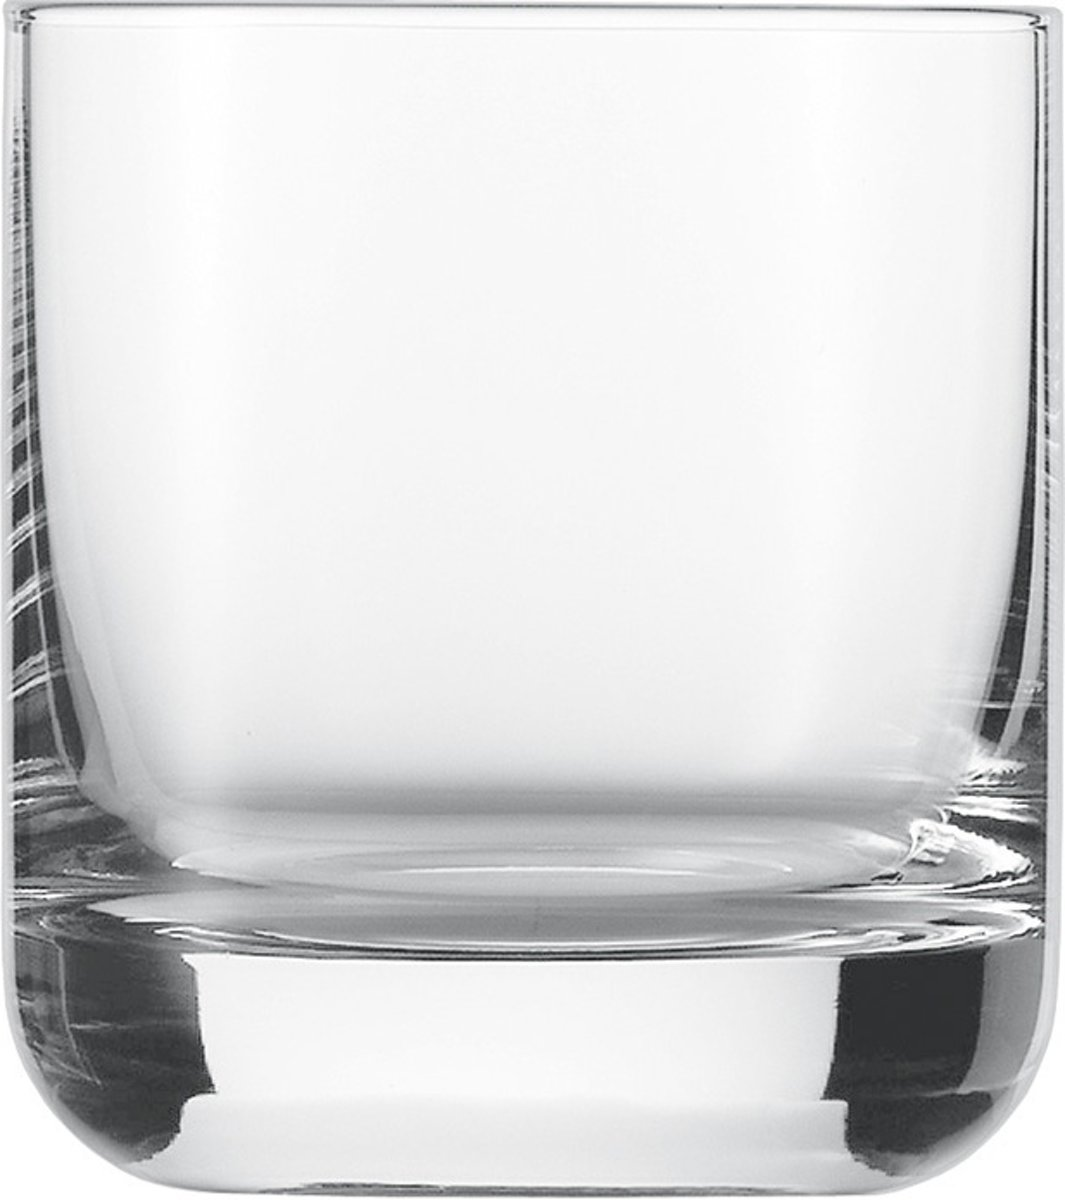 Schott Zwiesel Convention Whiskyglas - 0.29 Ltr - 6 Stuks kopen